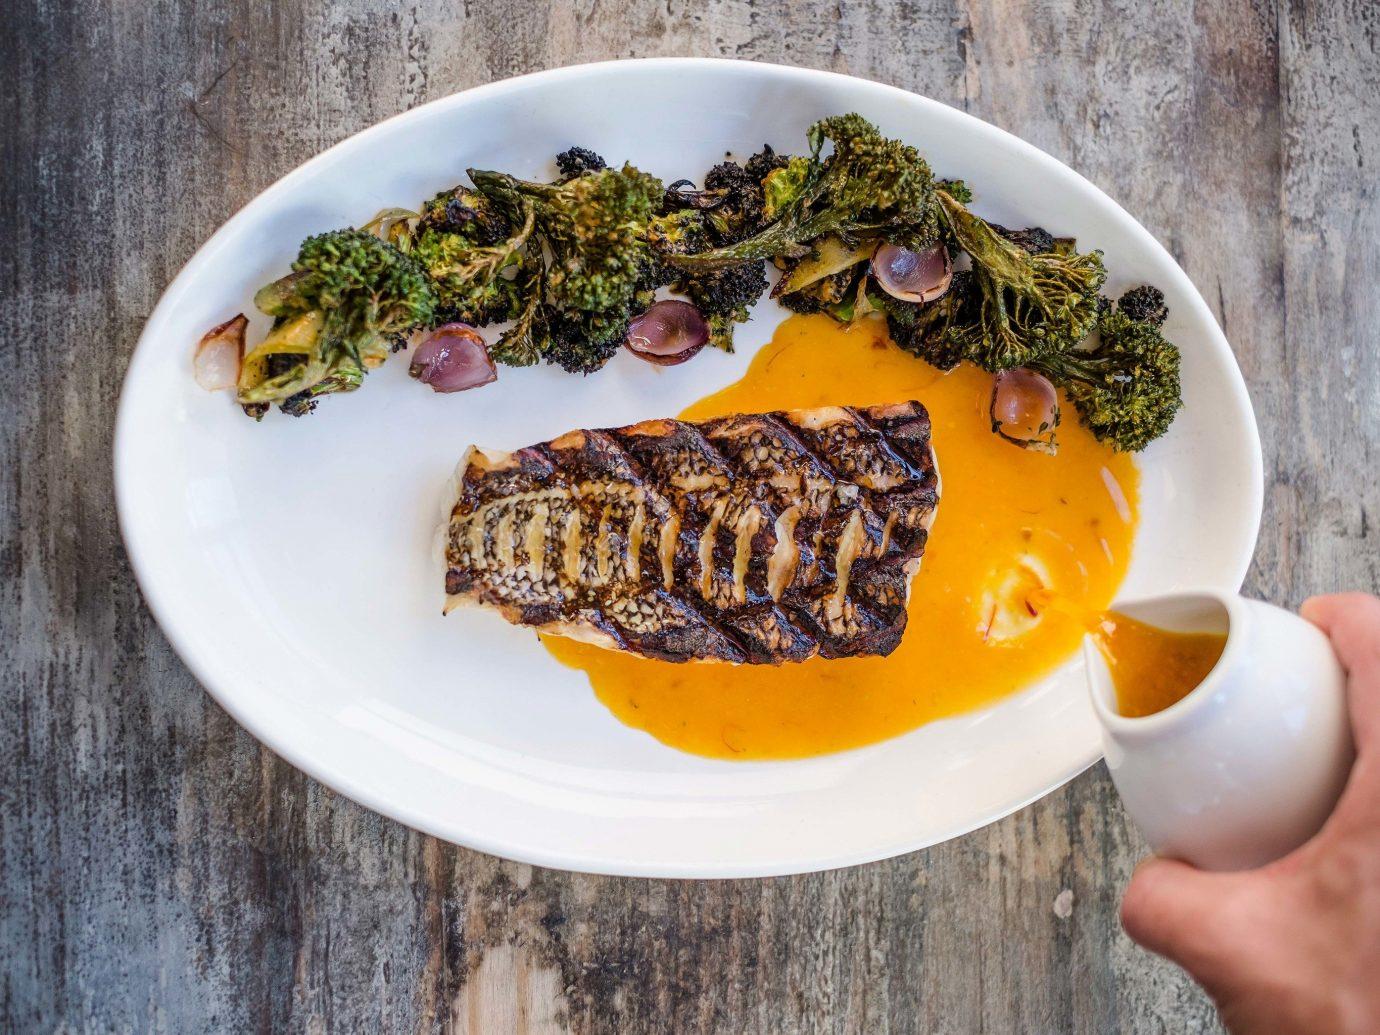 Food + Drink Phildelphia plate food dish leaf vegetable vegetarian food vegetable tea beverage cuisine recipe superfood meat meal